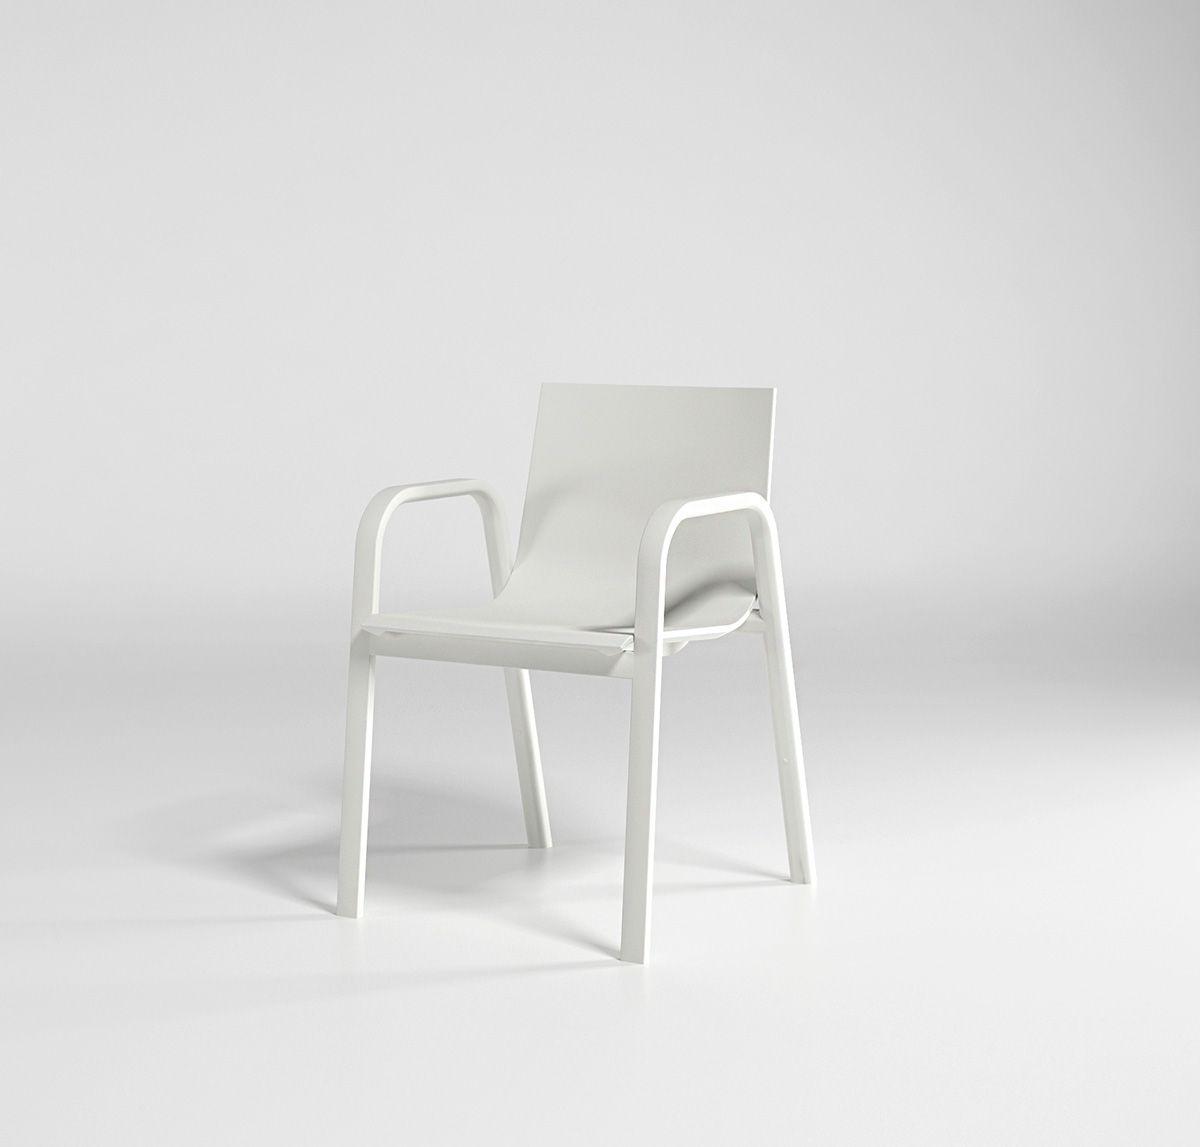 04-stack-system-chair-borja-garcia-gandiablasco